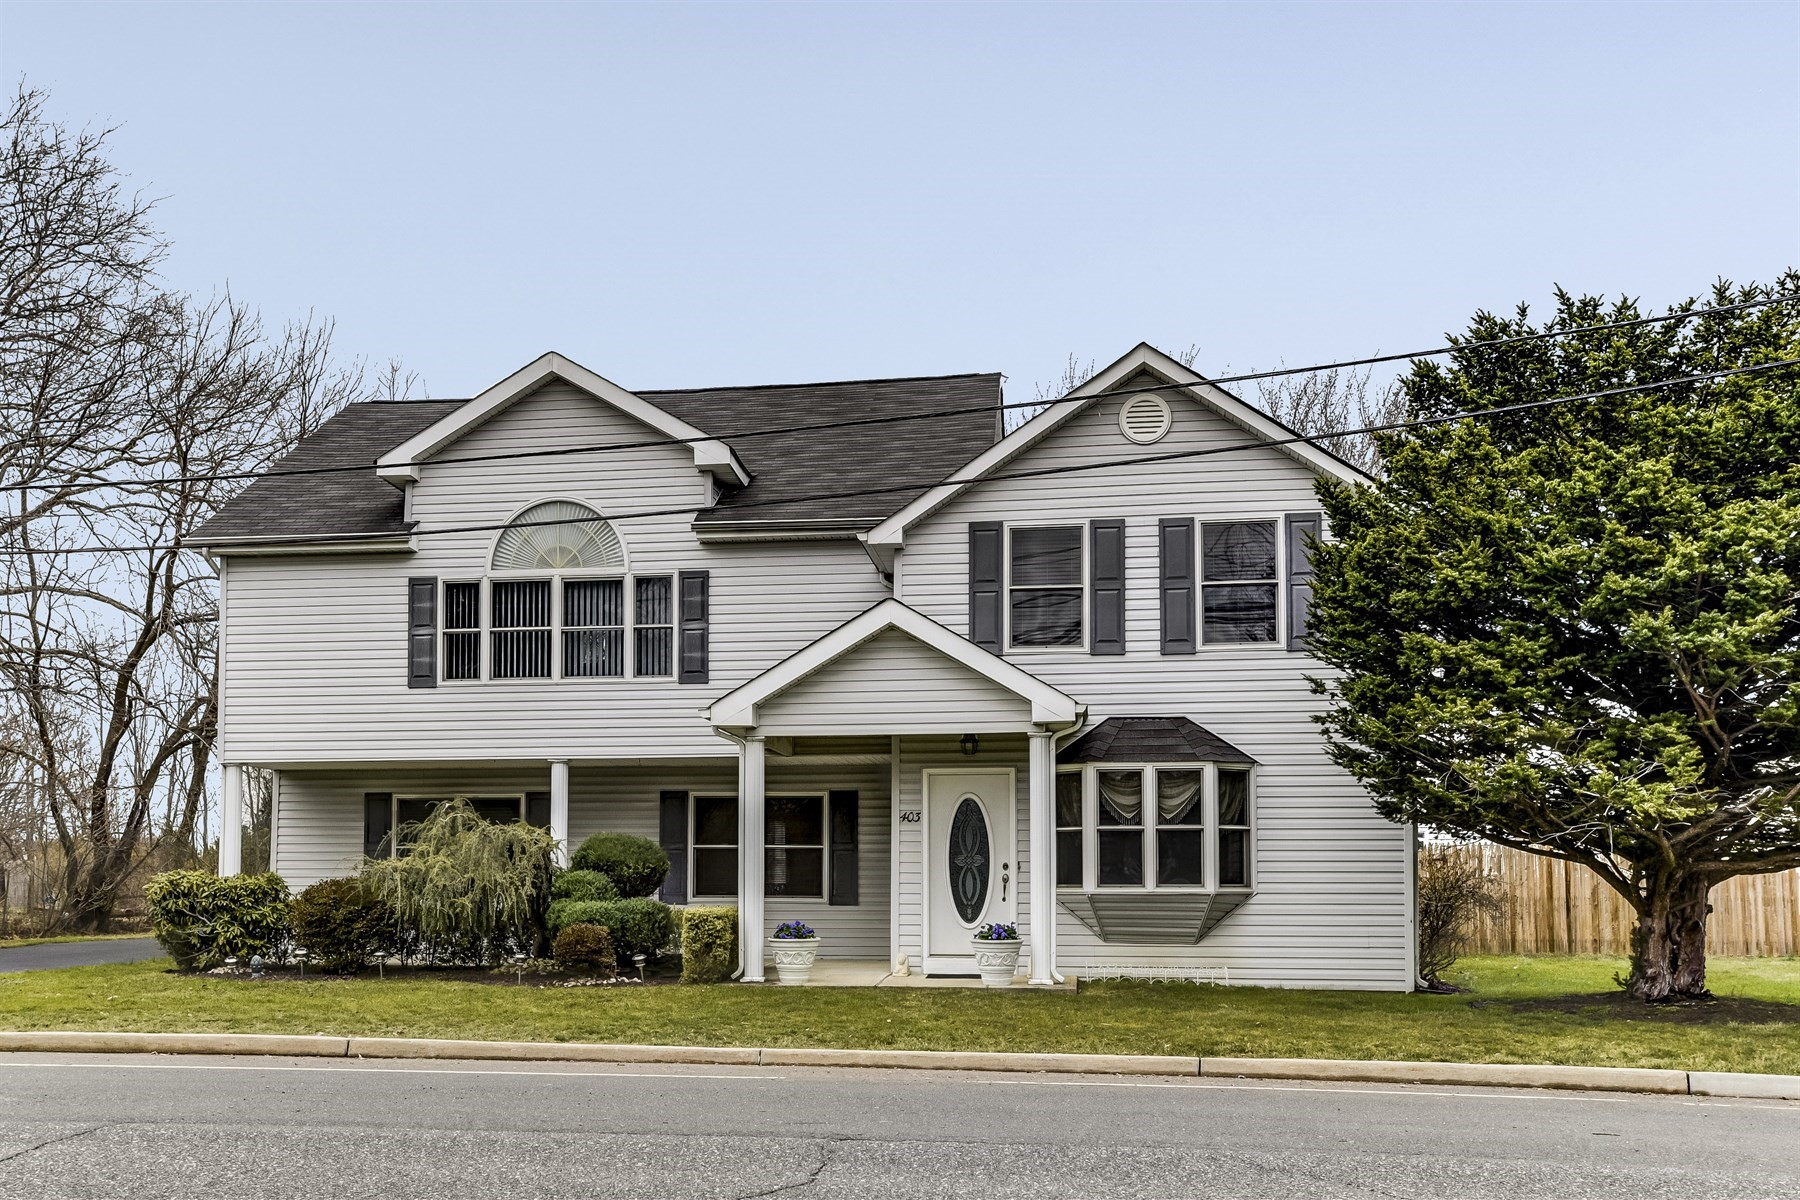 Частный односемейный дом для того Продажа на Where your home reflects your style 403 E. Freehold Road Freehold, Нью-Джерси 07728 Соединенные Штаты